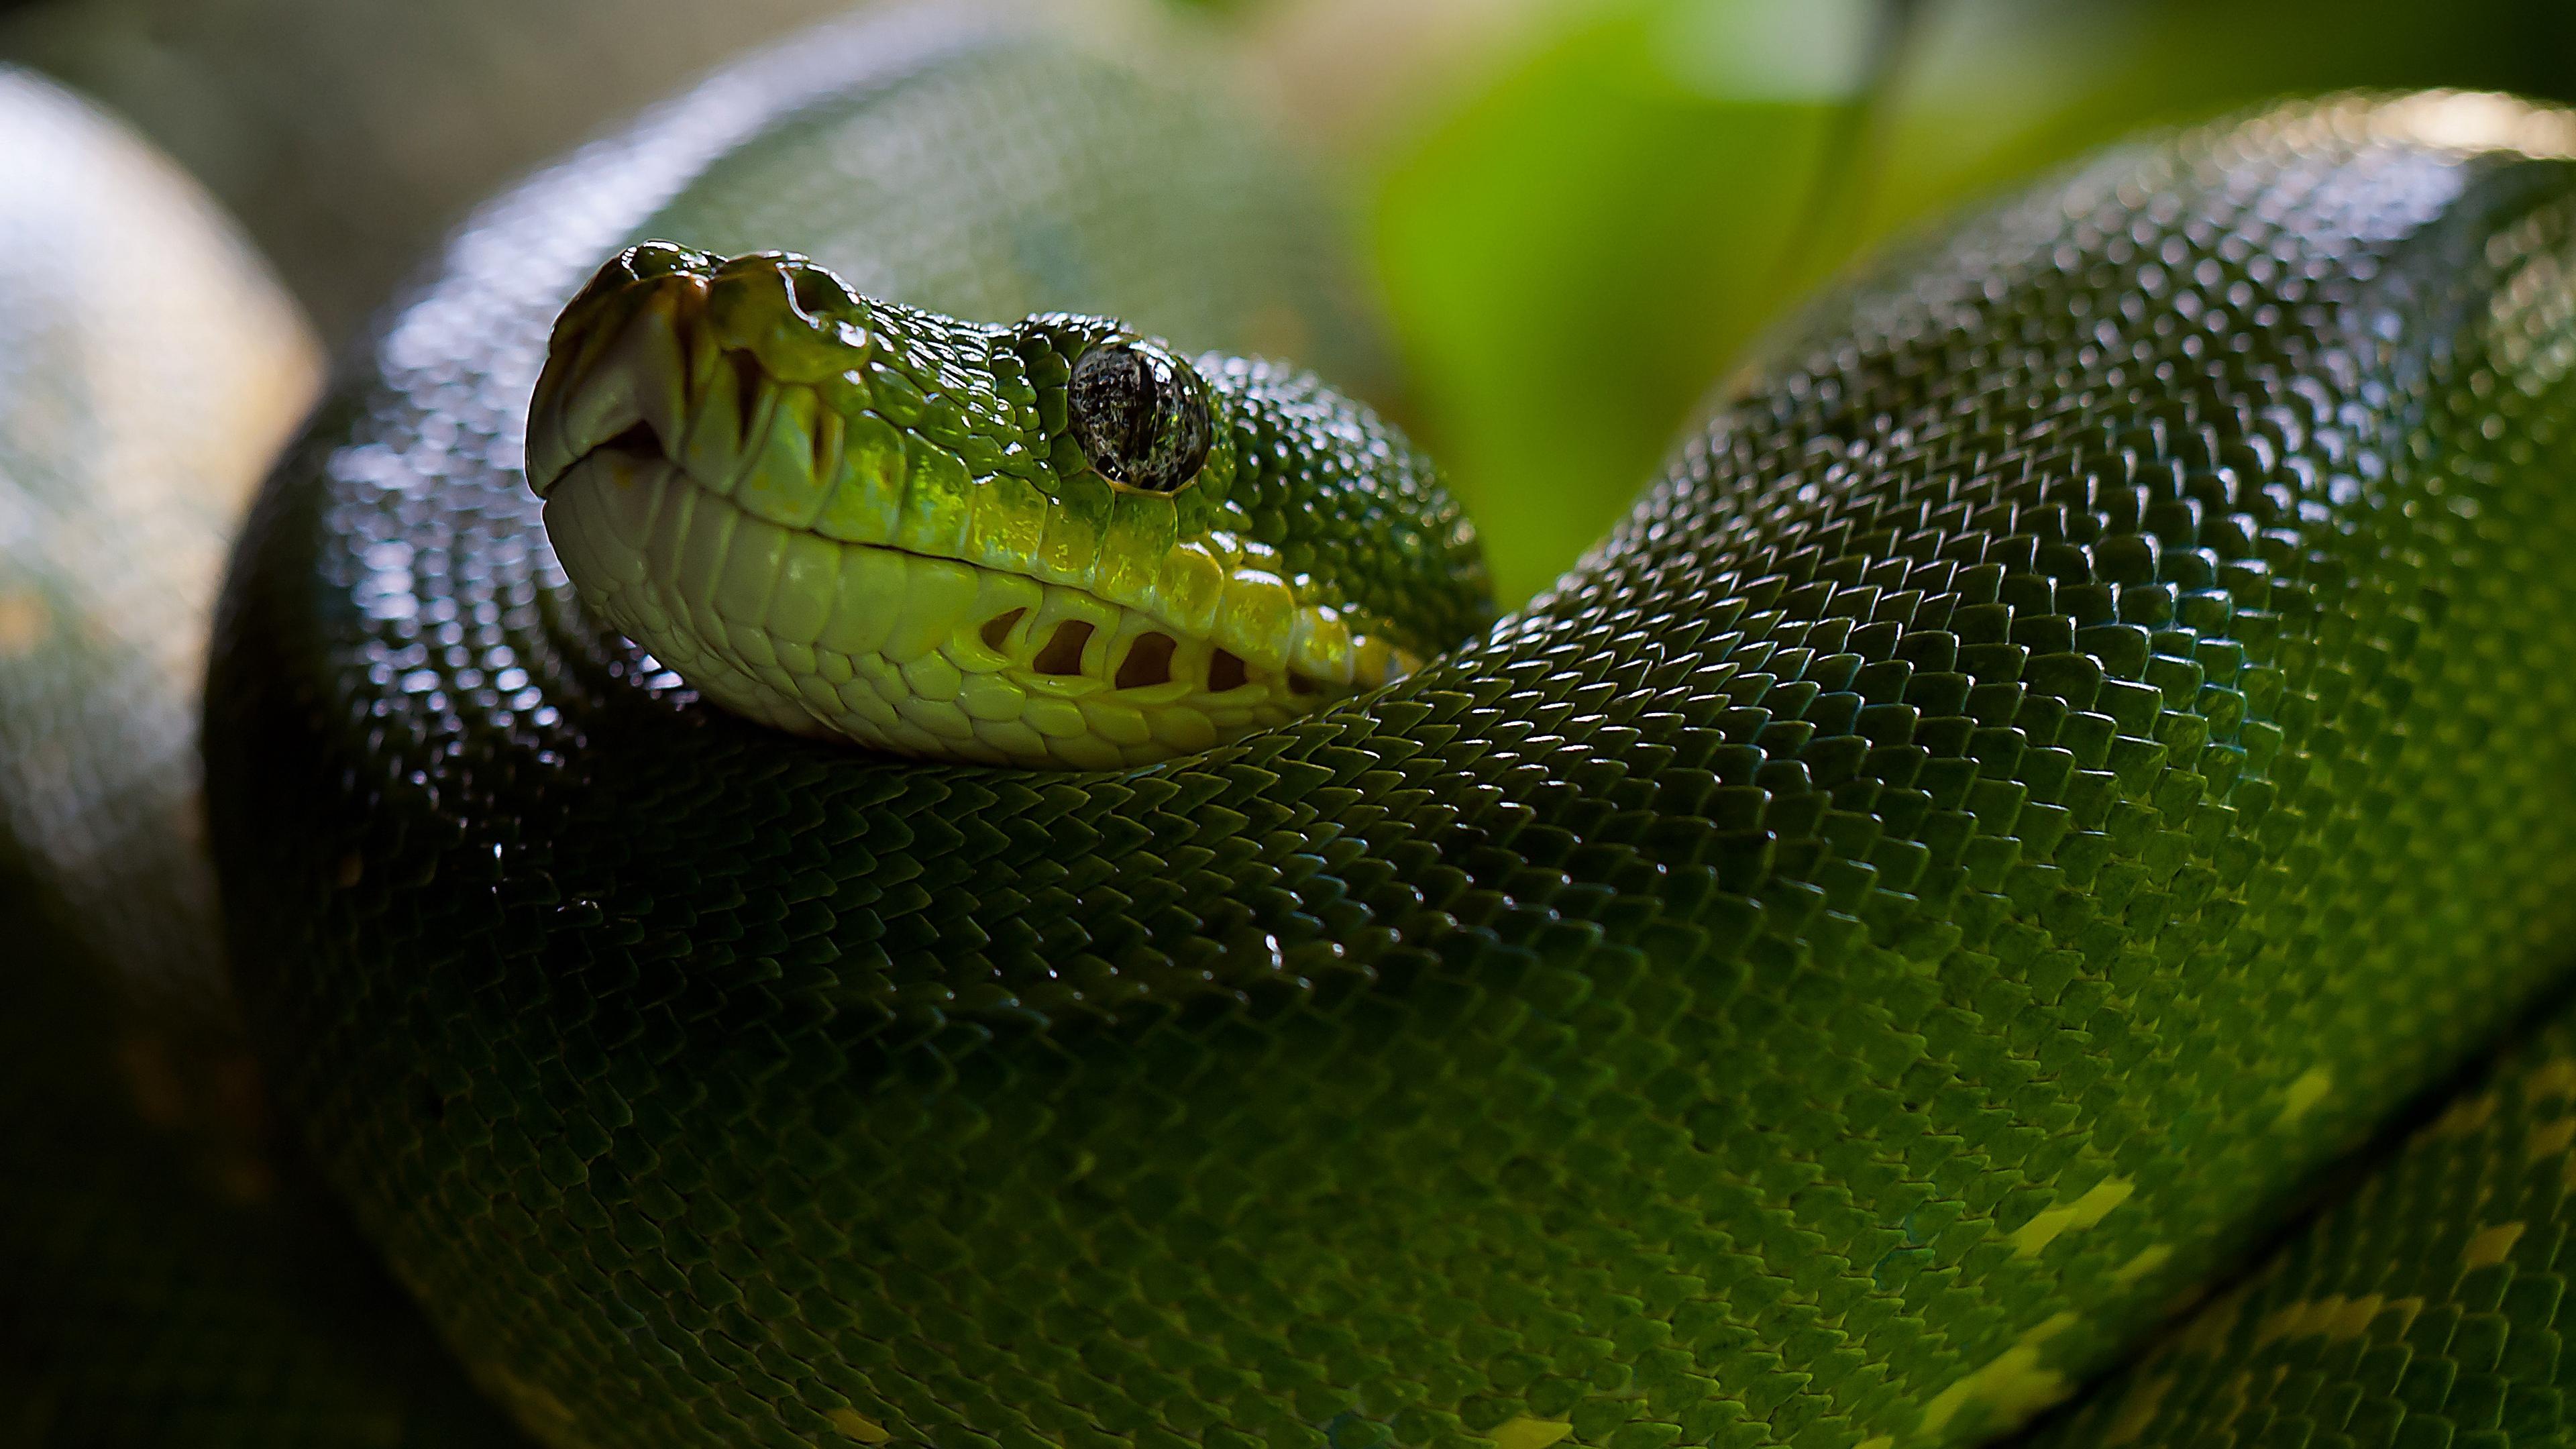 python snake head scales 4k 1542242408 - python, snake, head, scales 4k - Snake, python, Head